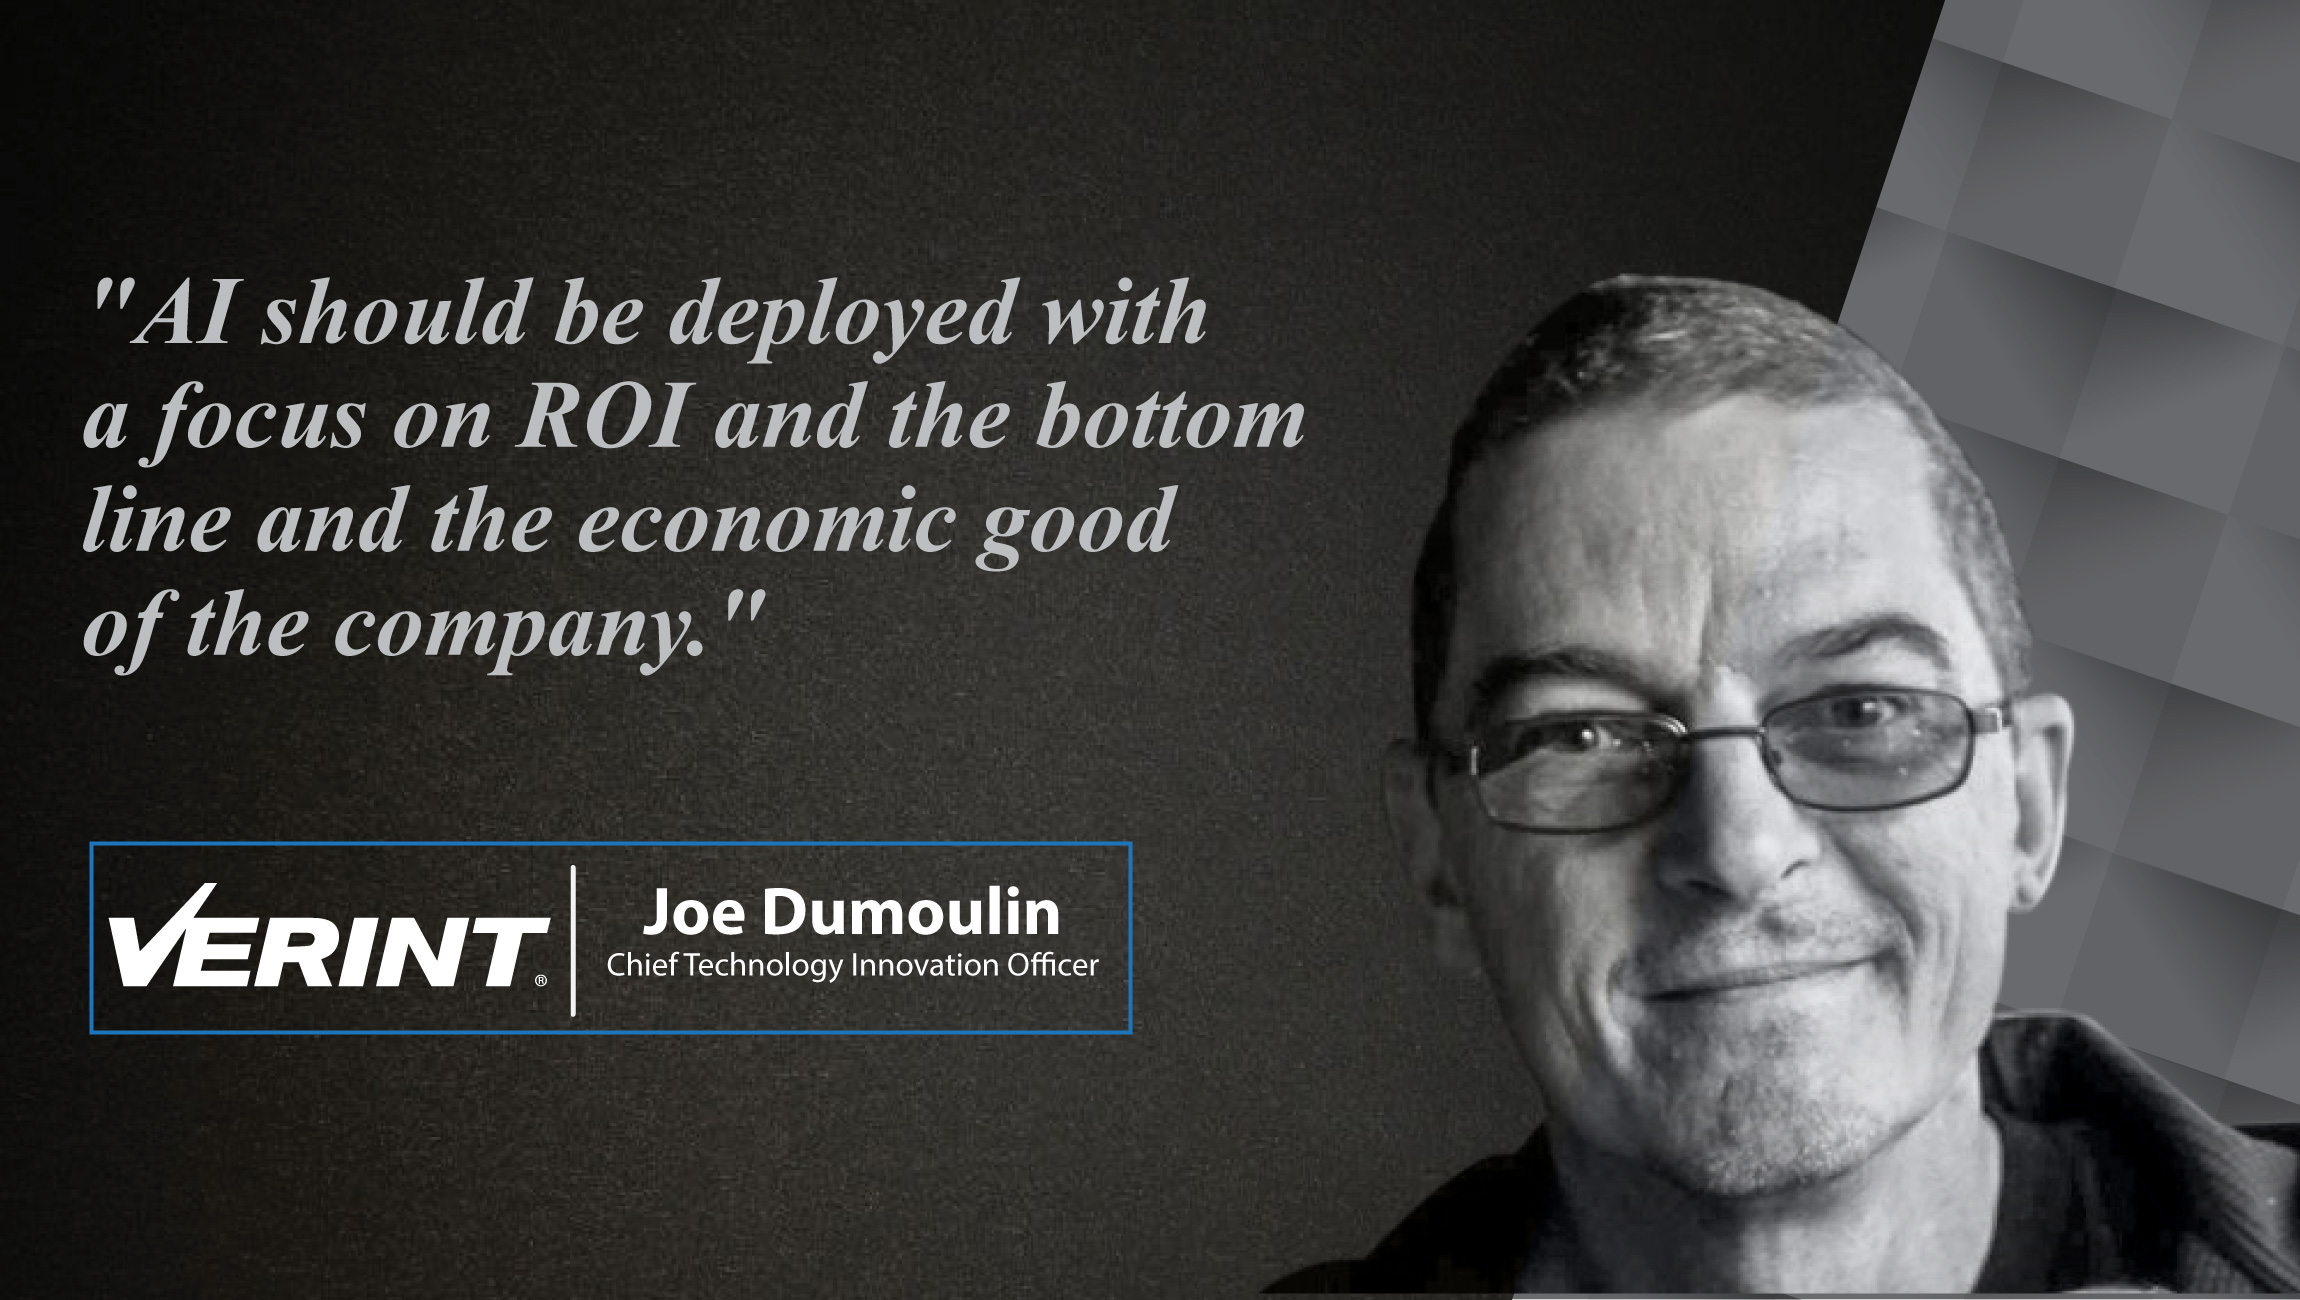 Joe-Dumoulin-CUE-CARD